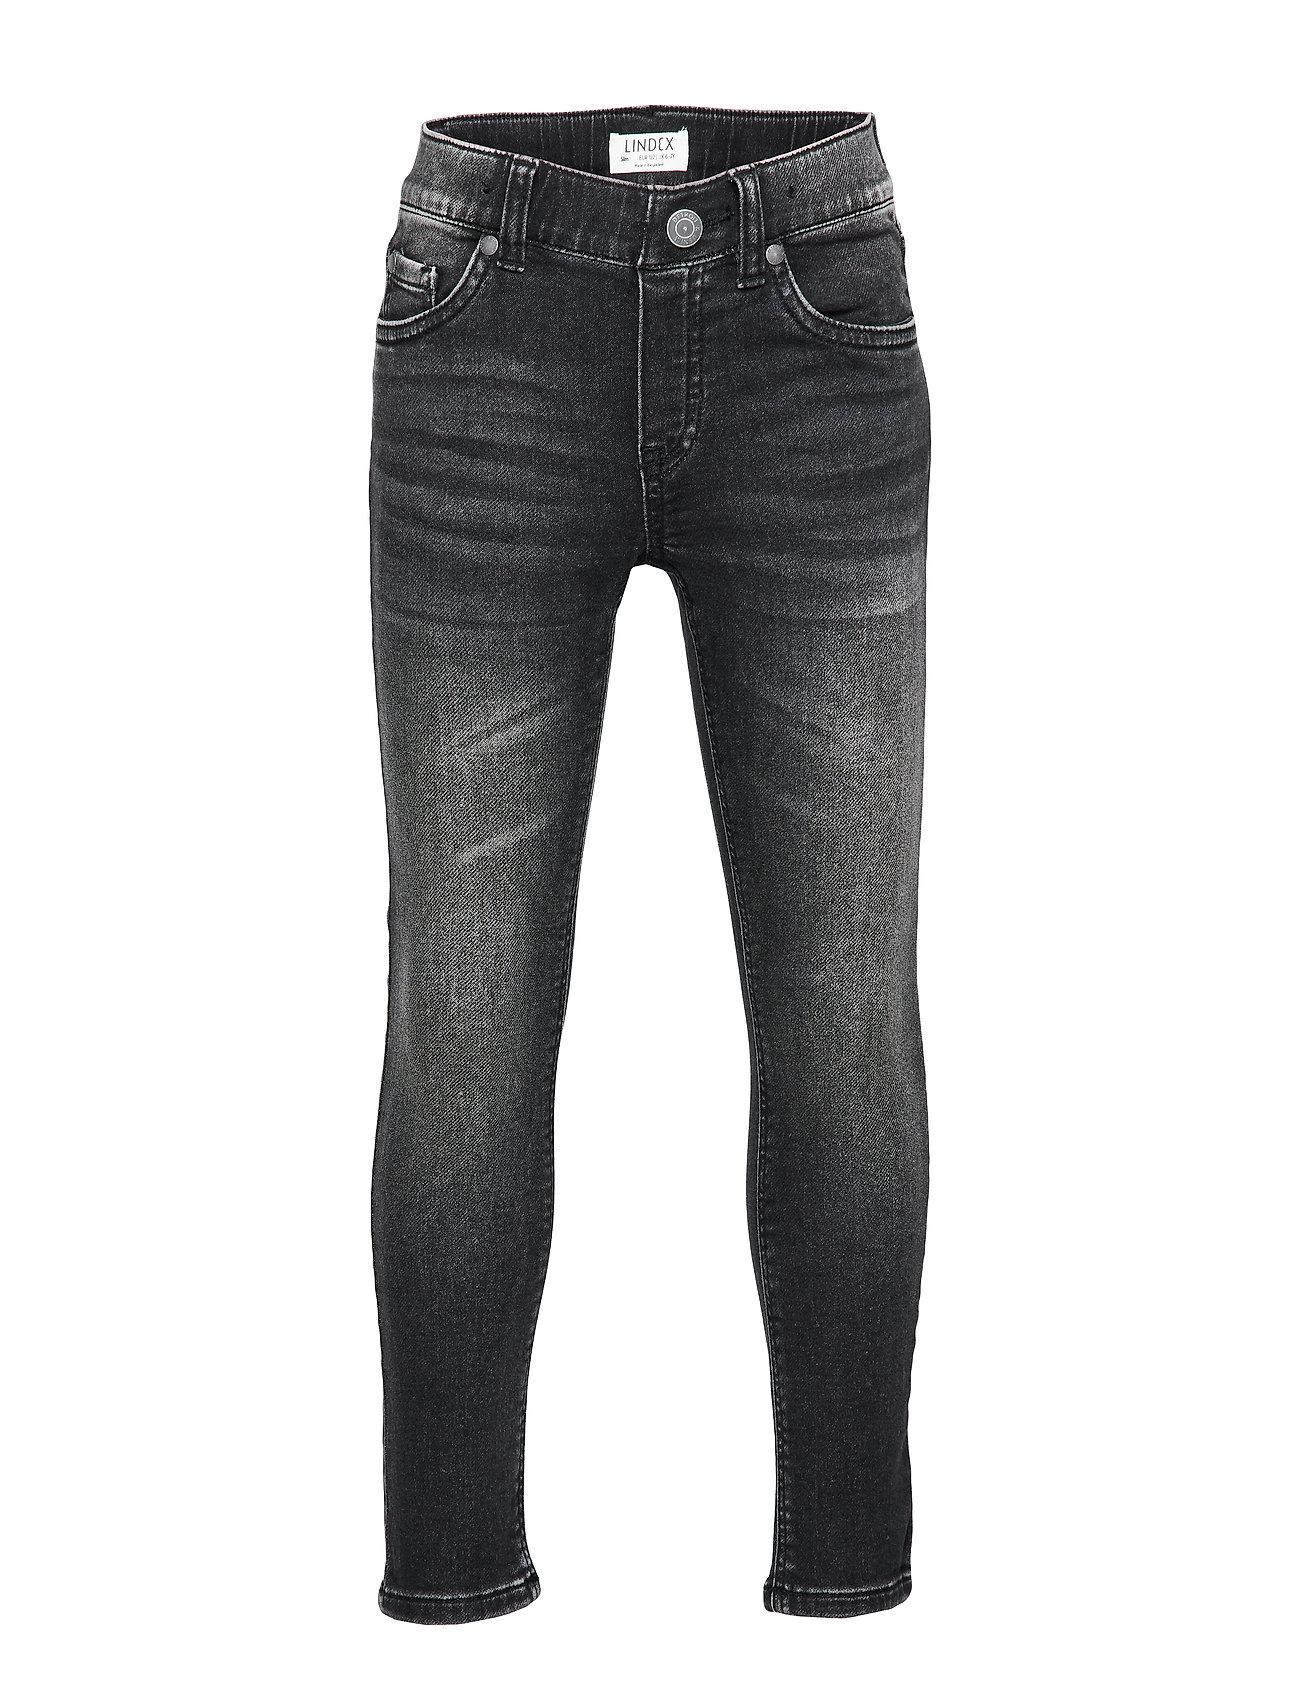 Trousers Denim Jersey Slim Jim Jeans Sort Lindex